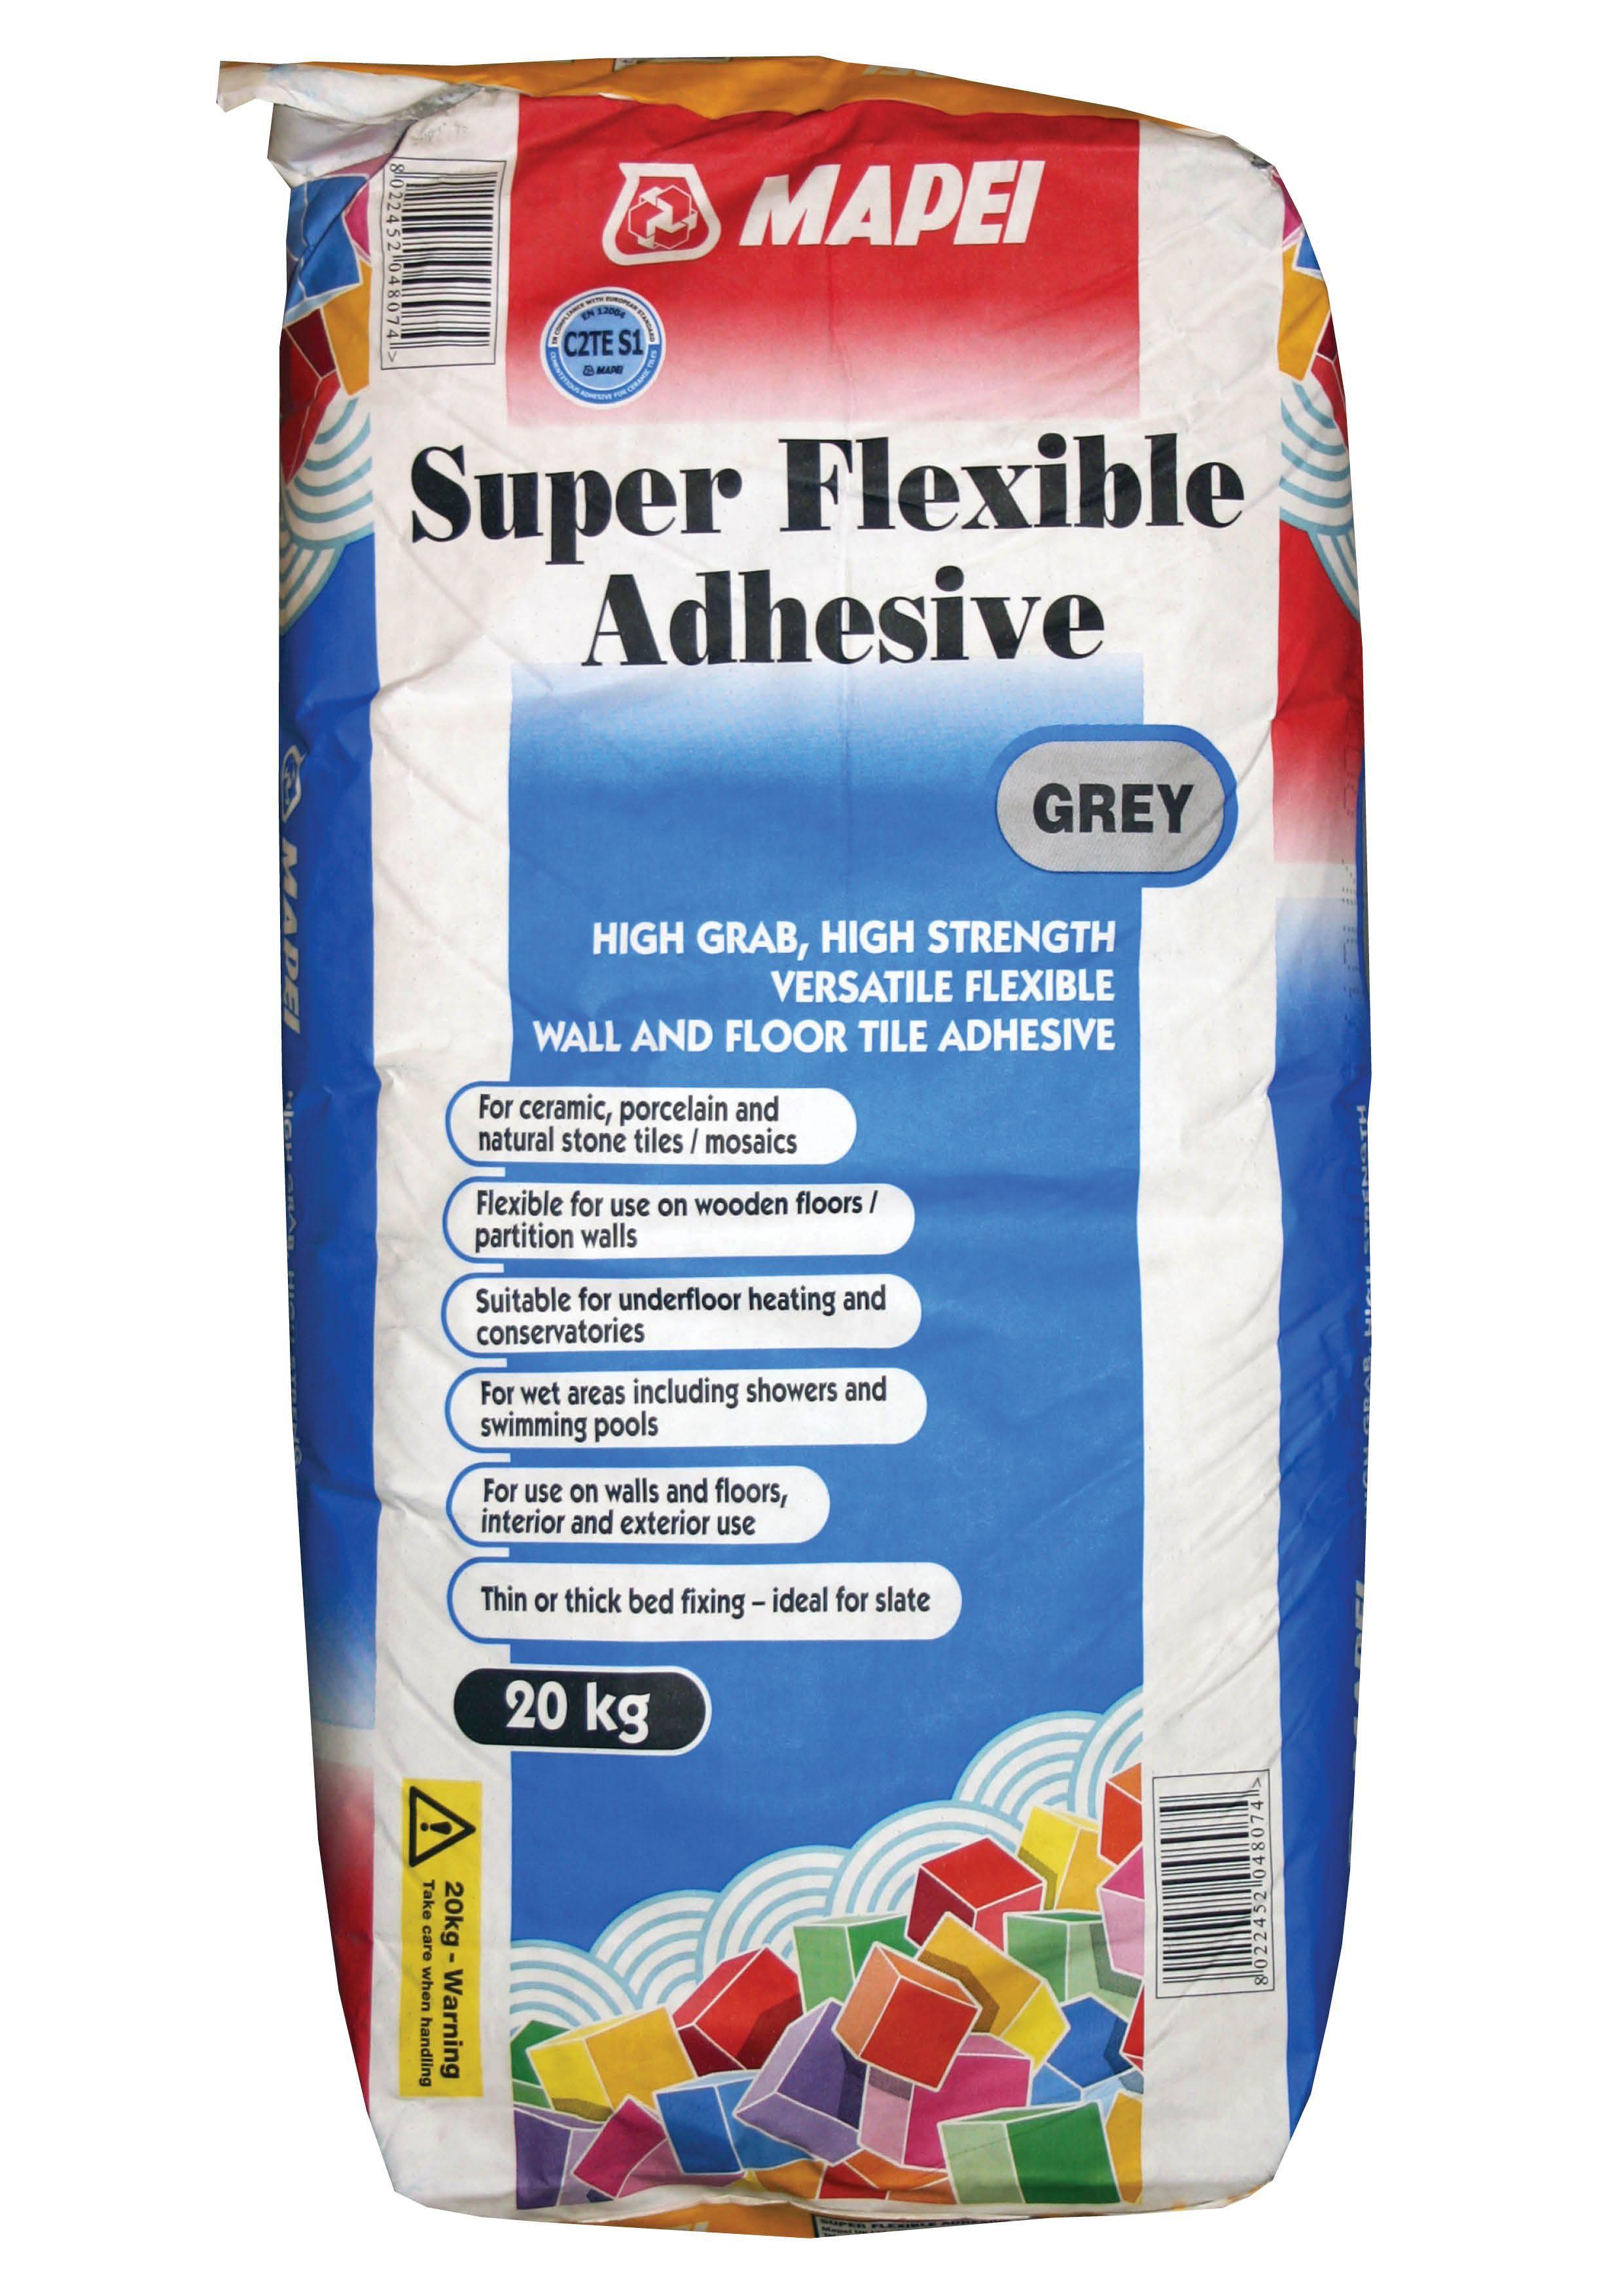 mapei super flexible grey tile adhesive 20kg